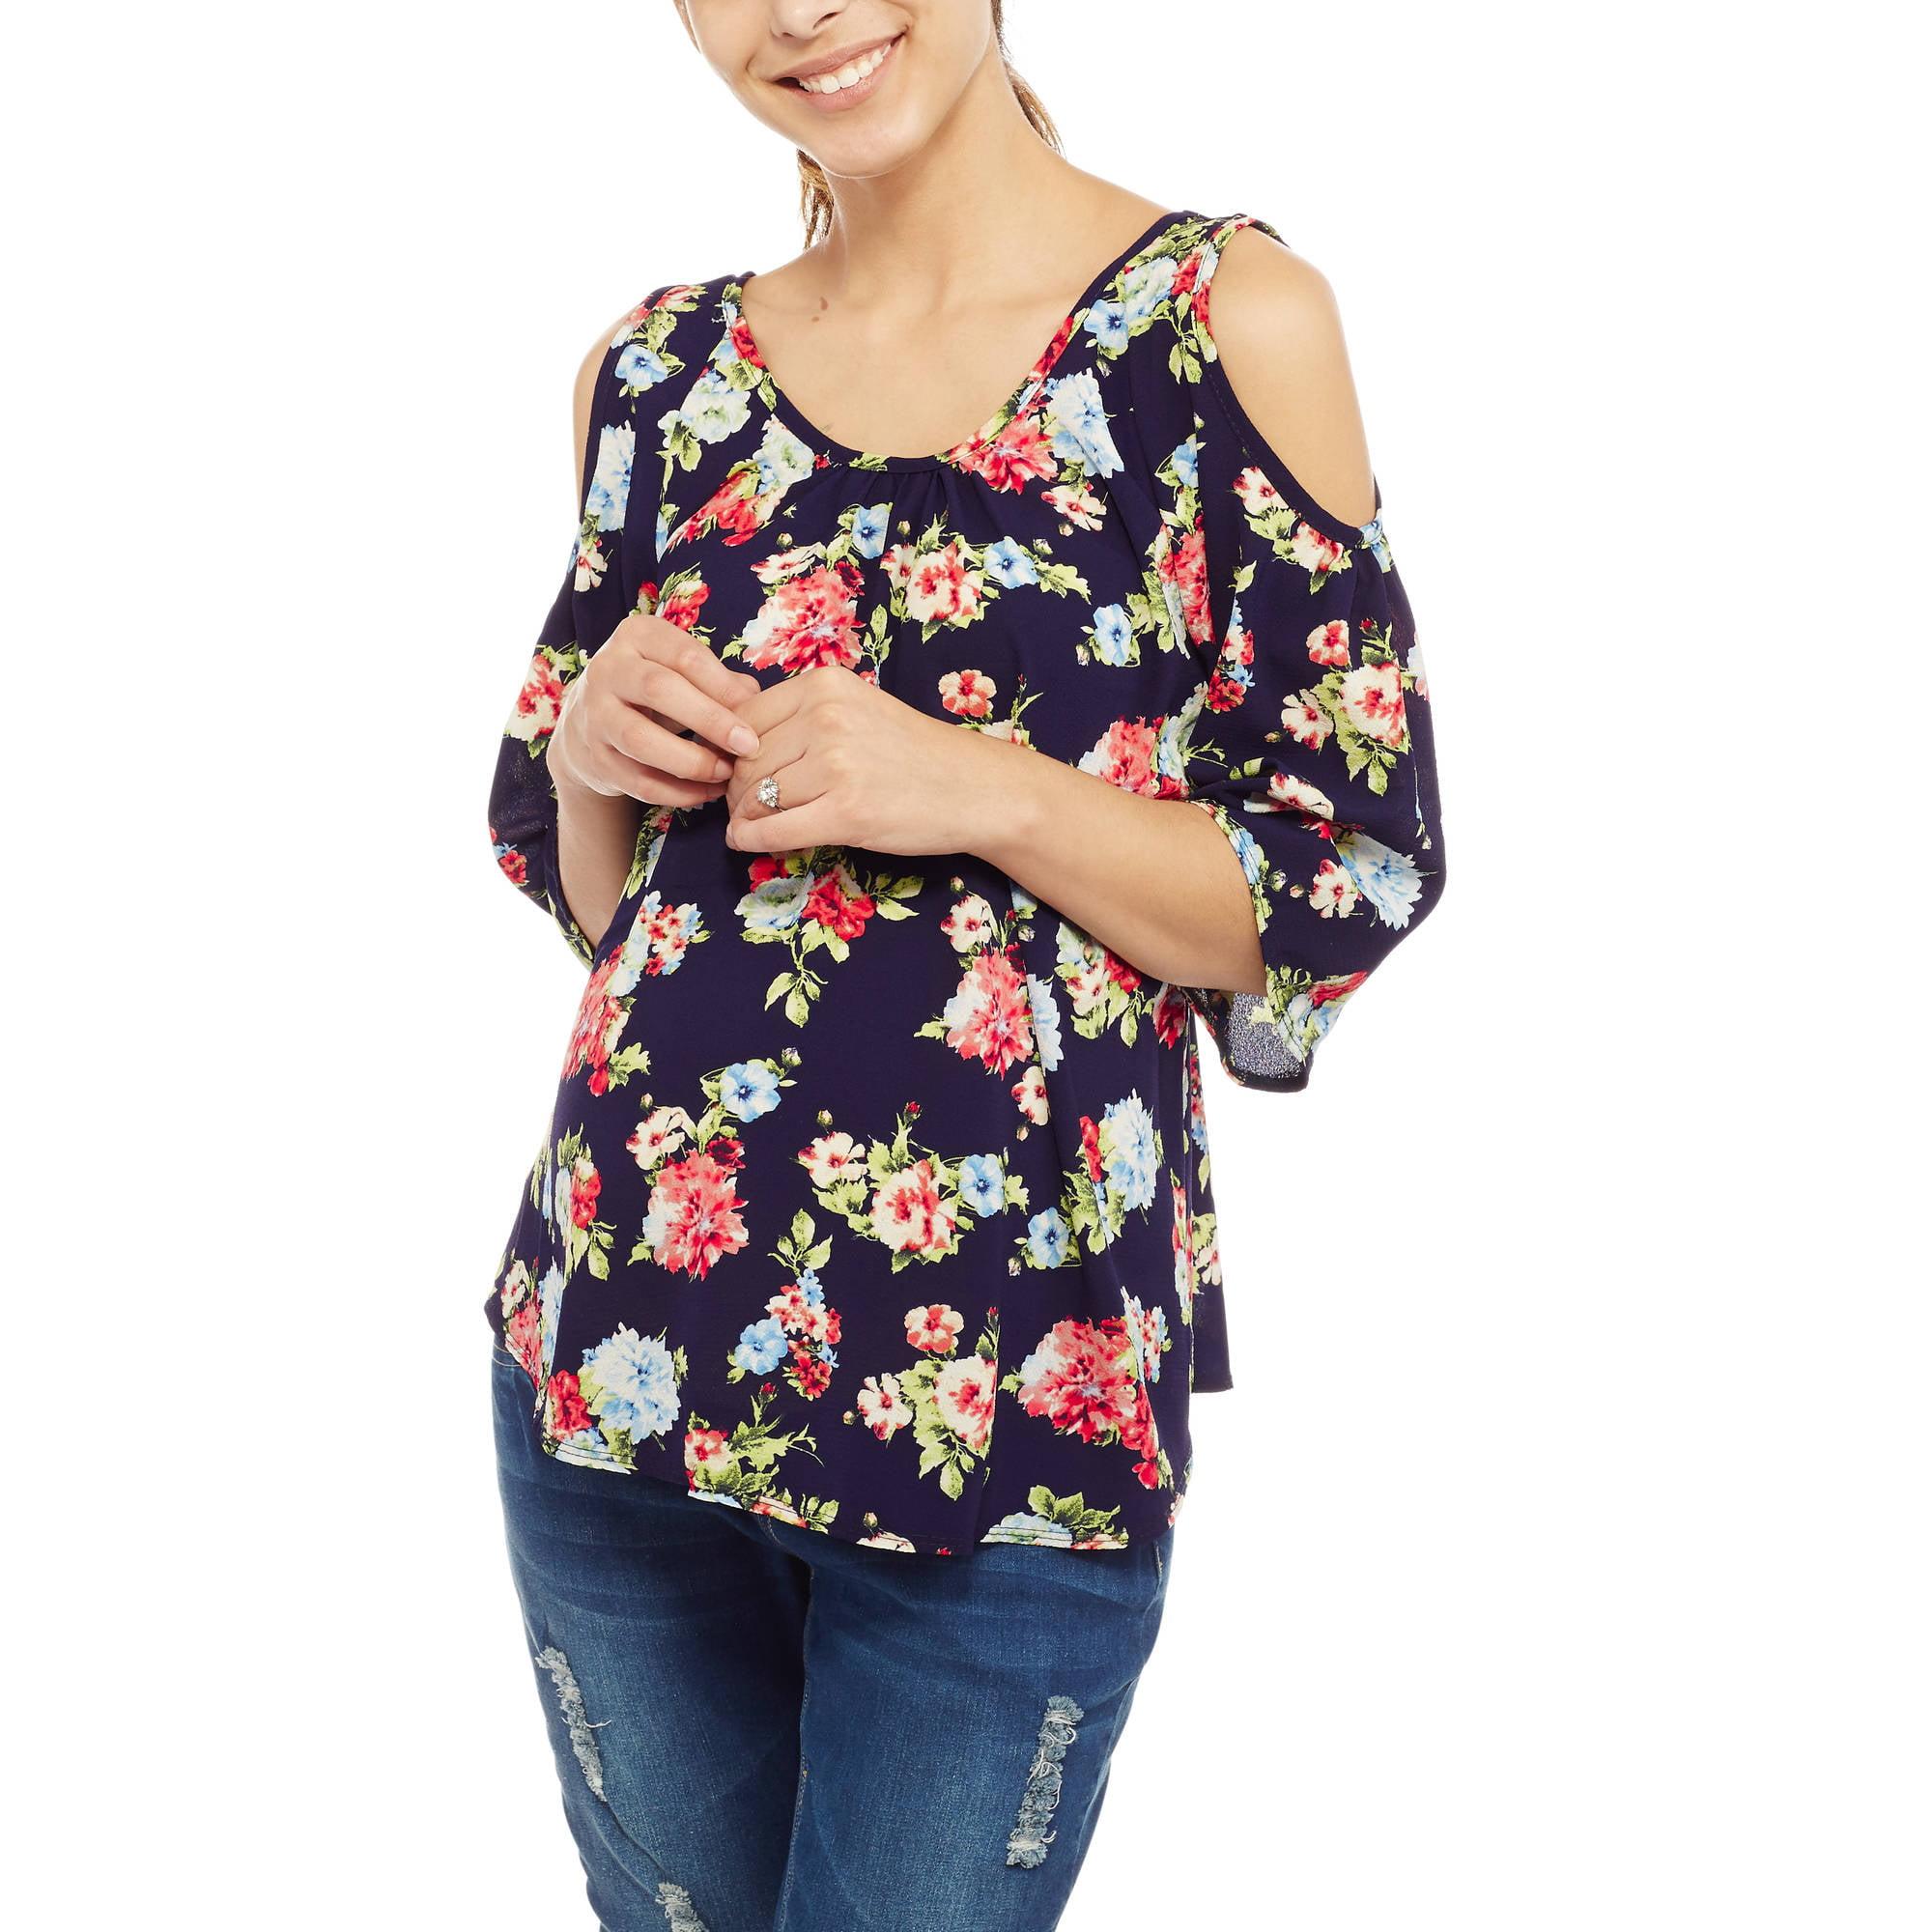 Due Time Maternity Floral Print Cold-Shoulder Top